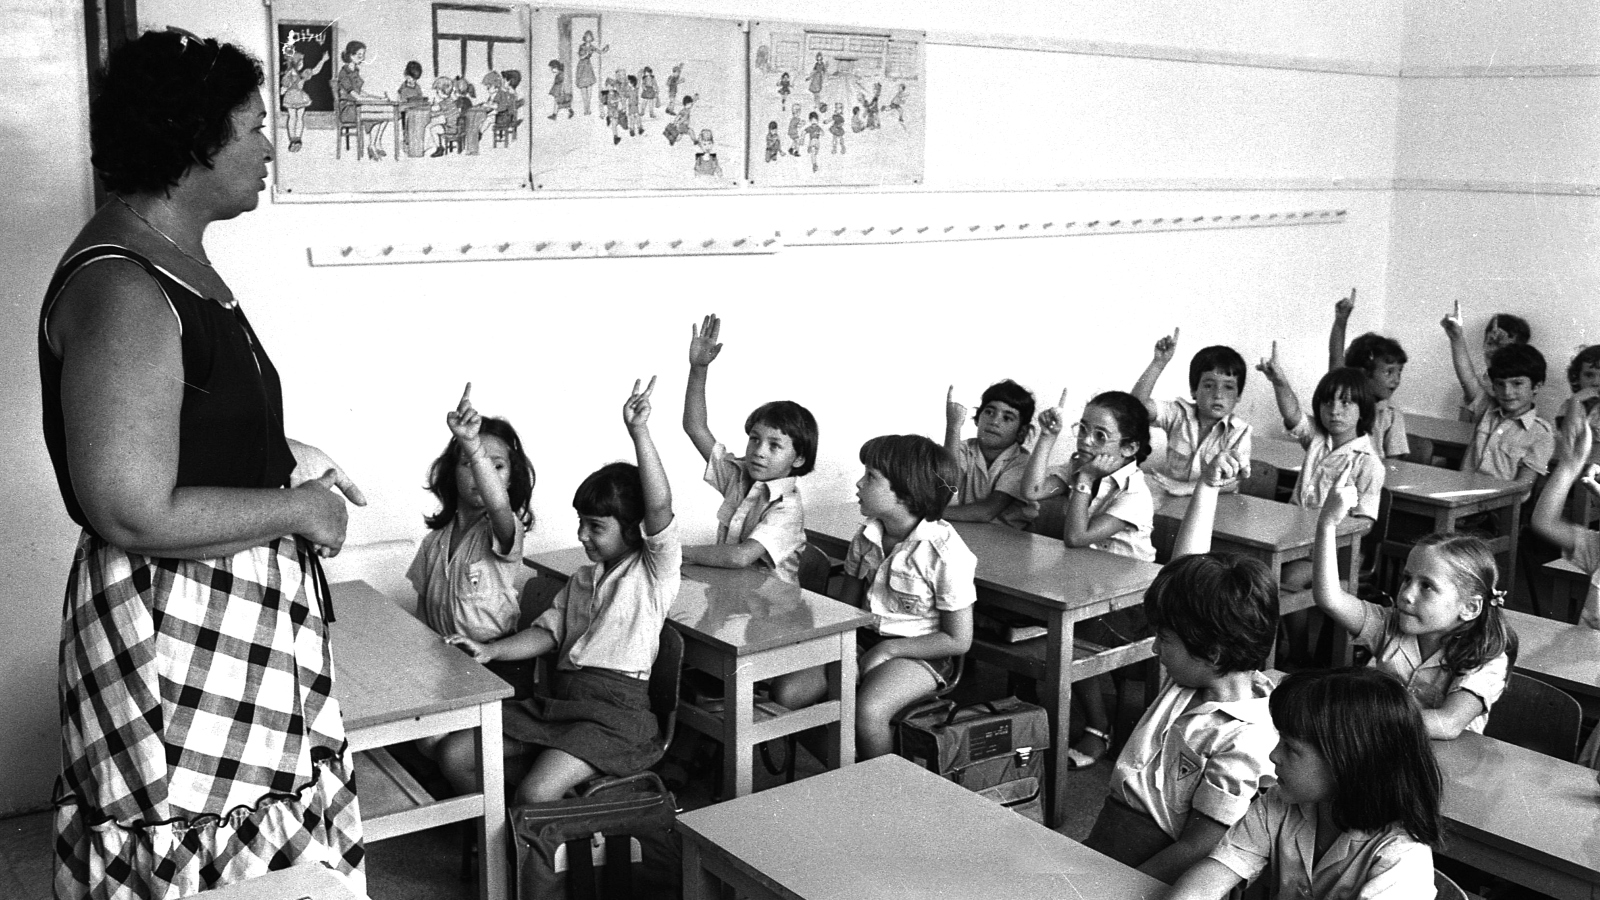 Israeli project seeks clues to old school photo mysteries